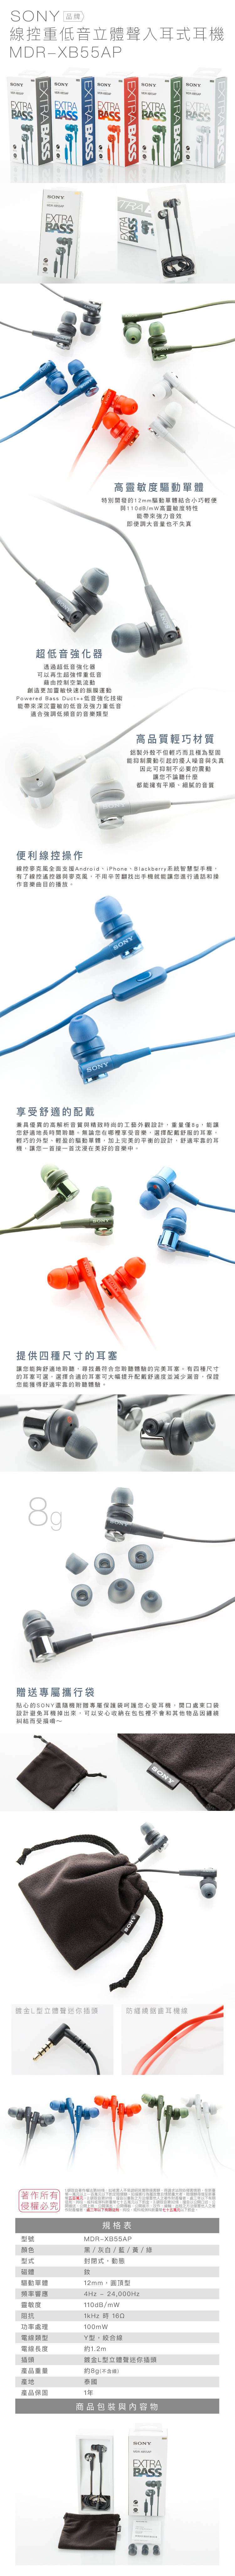 headset_37